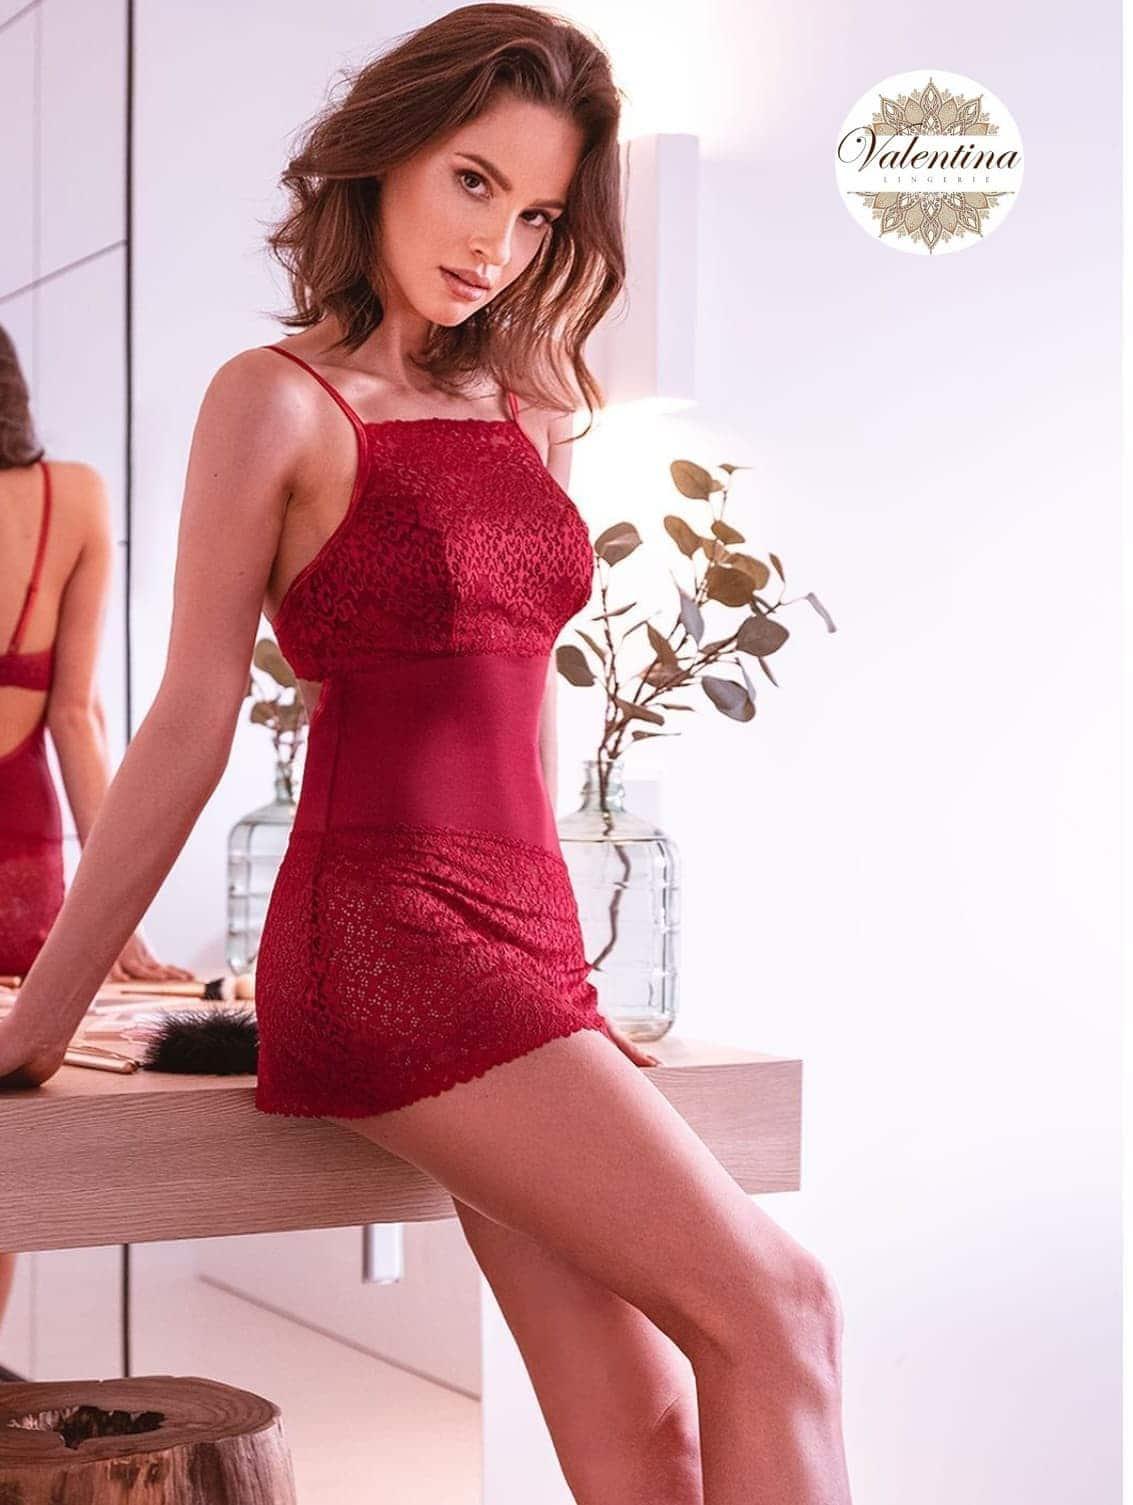 Linda Nuisette rouge valentina lingerie